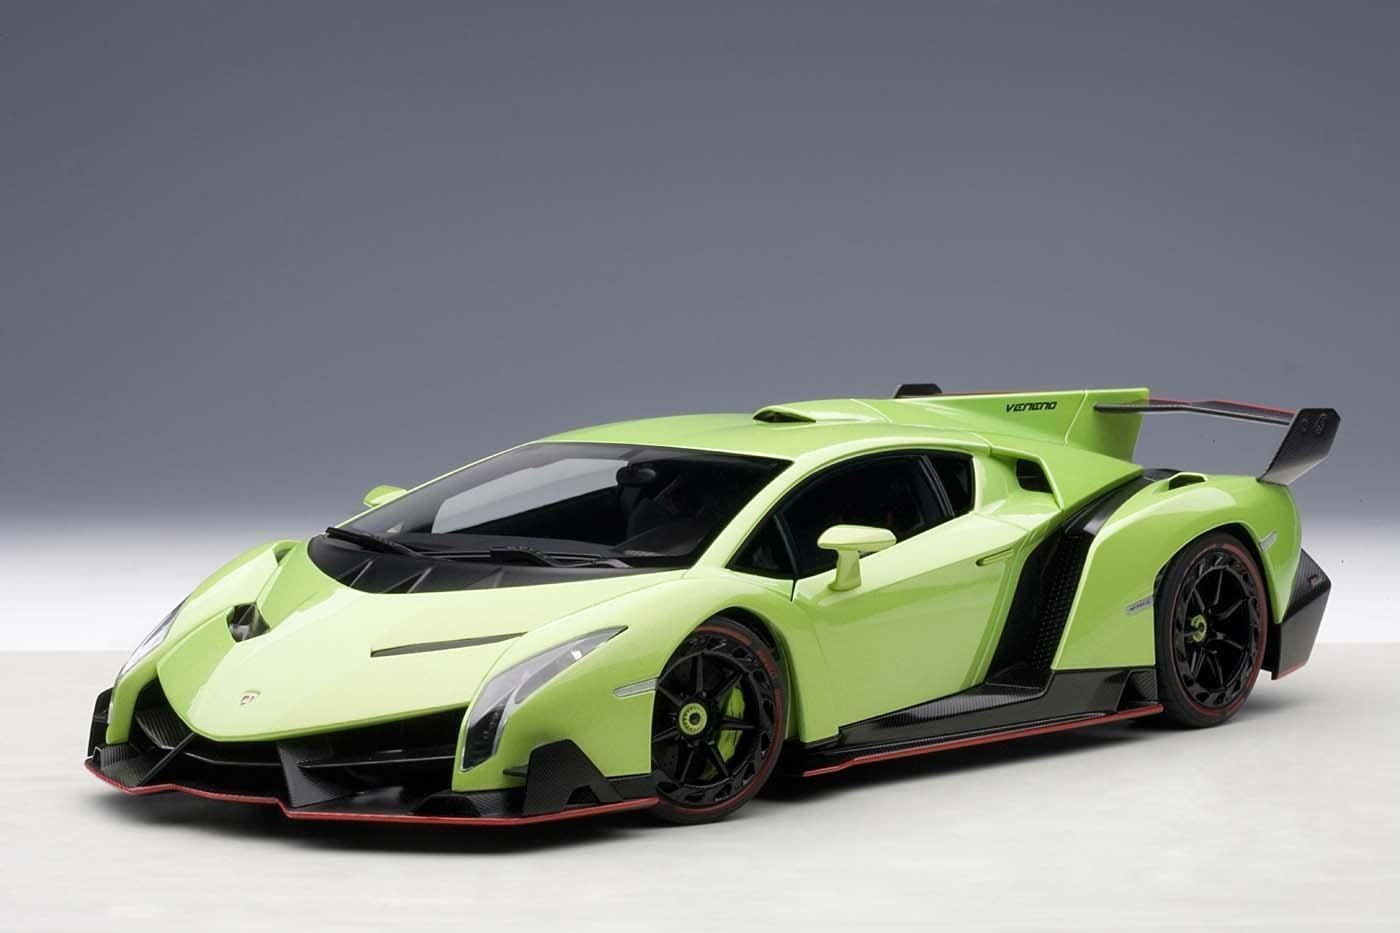 Awesome Great 1/18 AUTOart 74509 LAMBORGHINI VENENO (GREEN ...